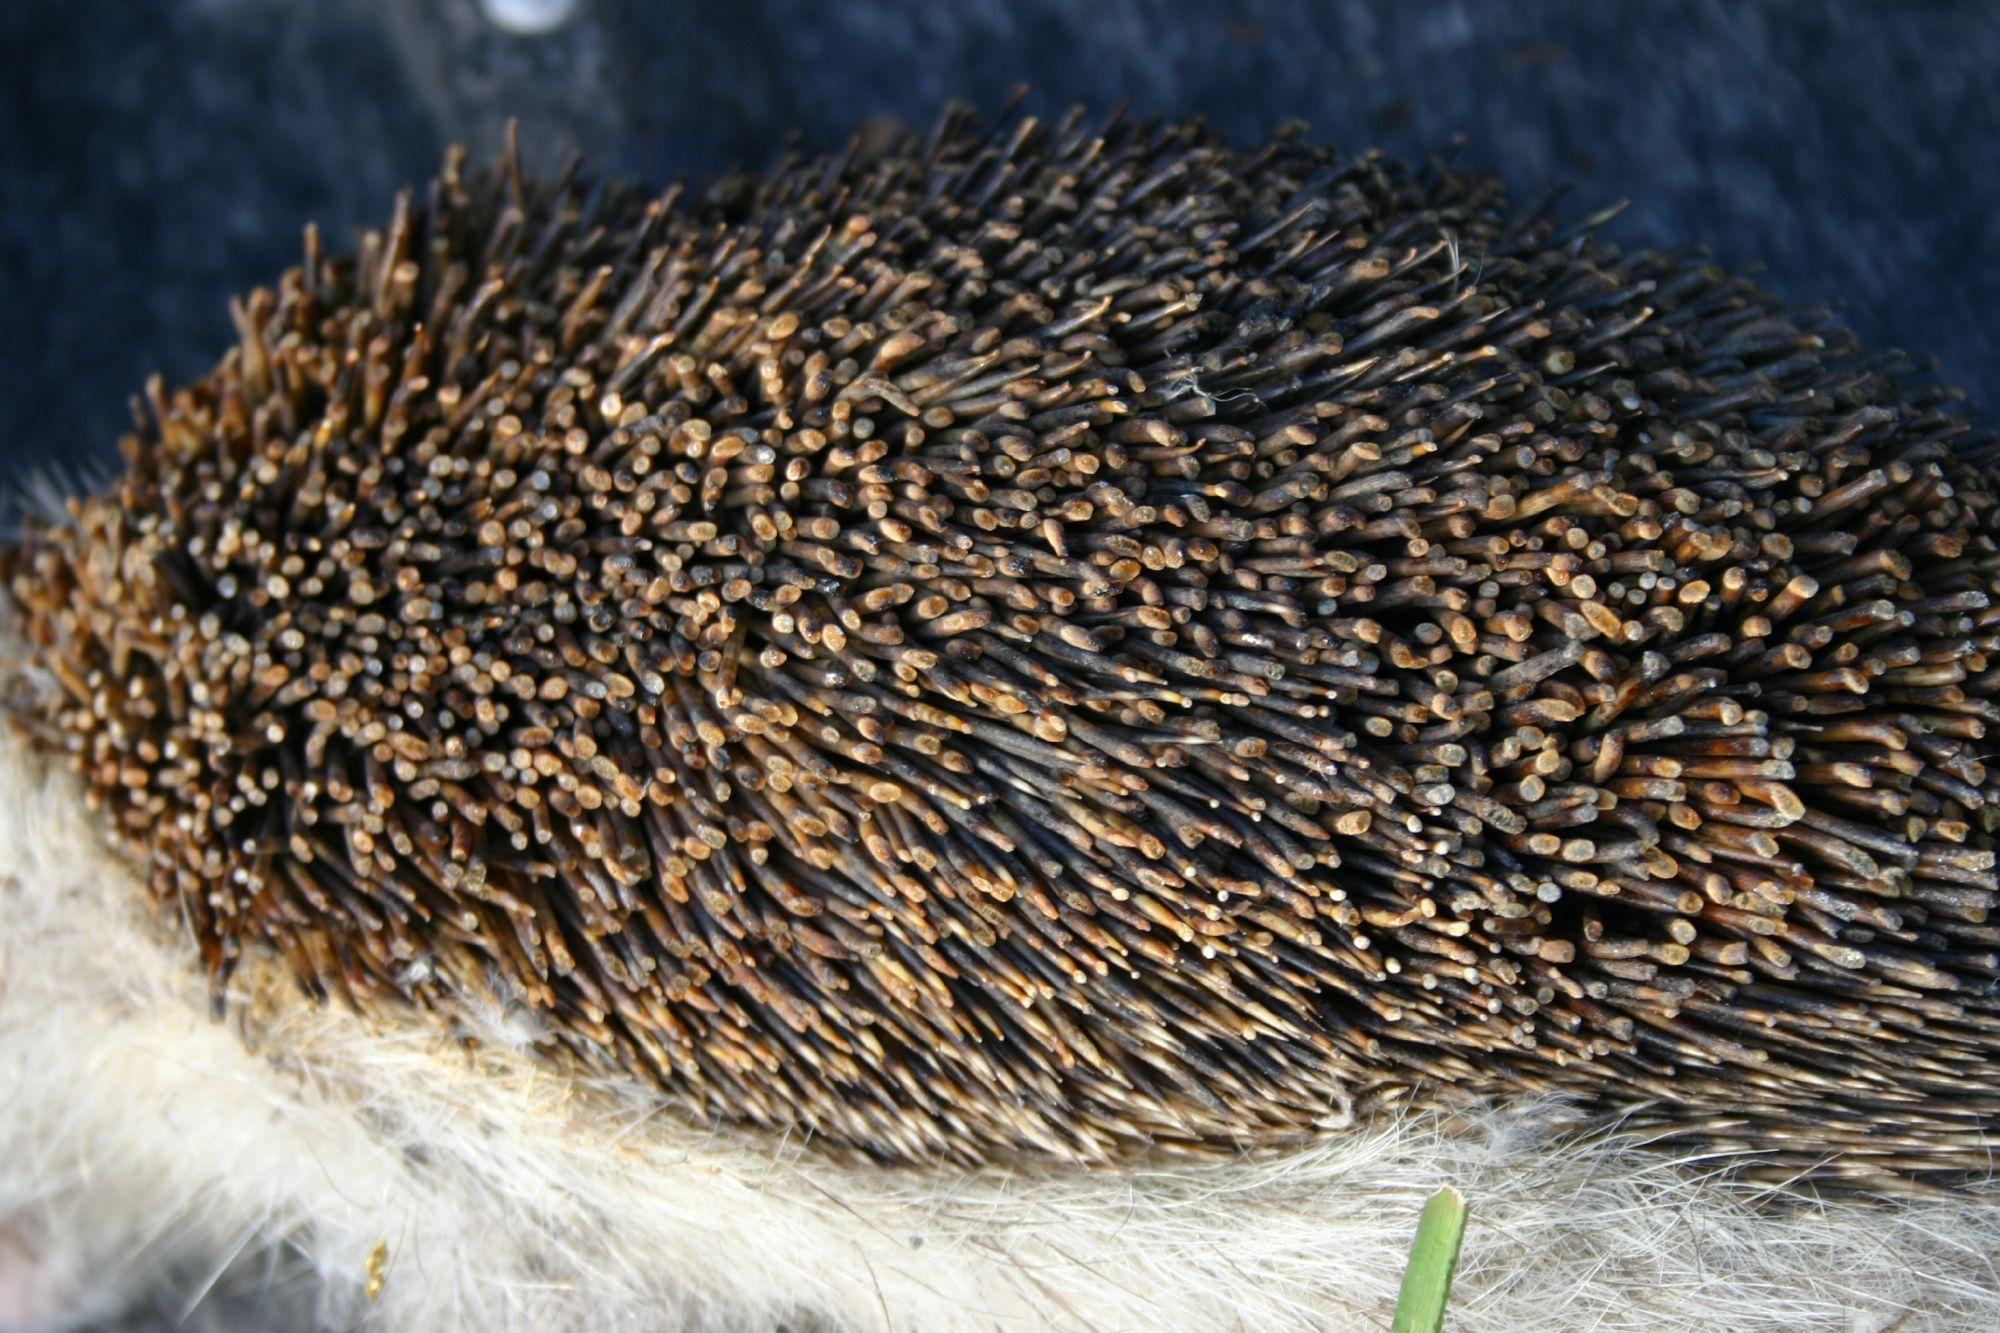 A hedgehog burnt by an Easter bonfire